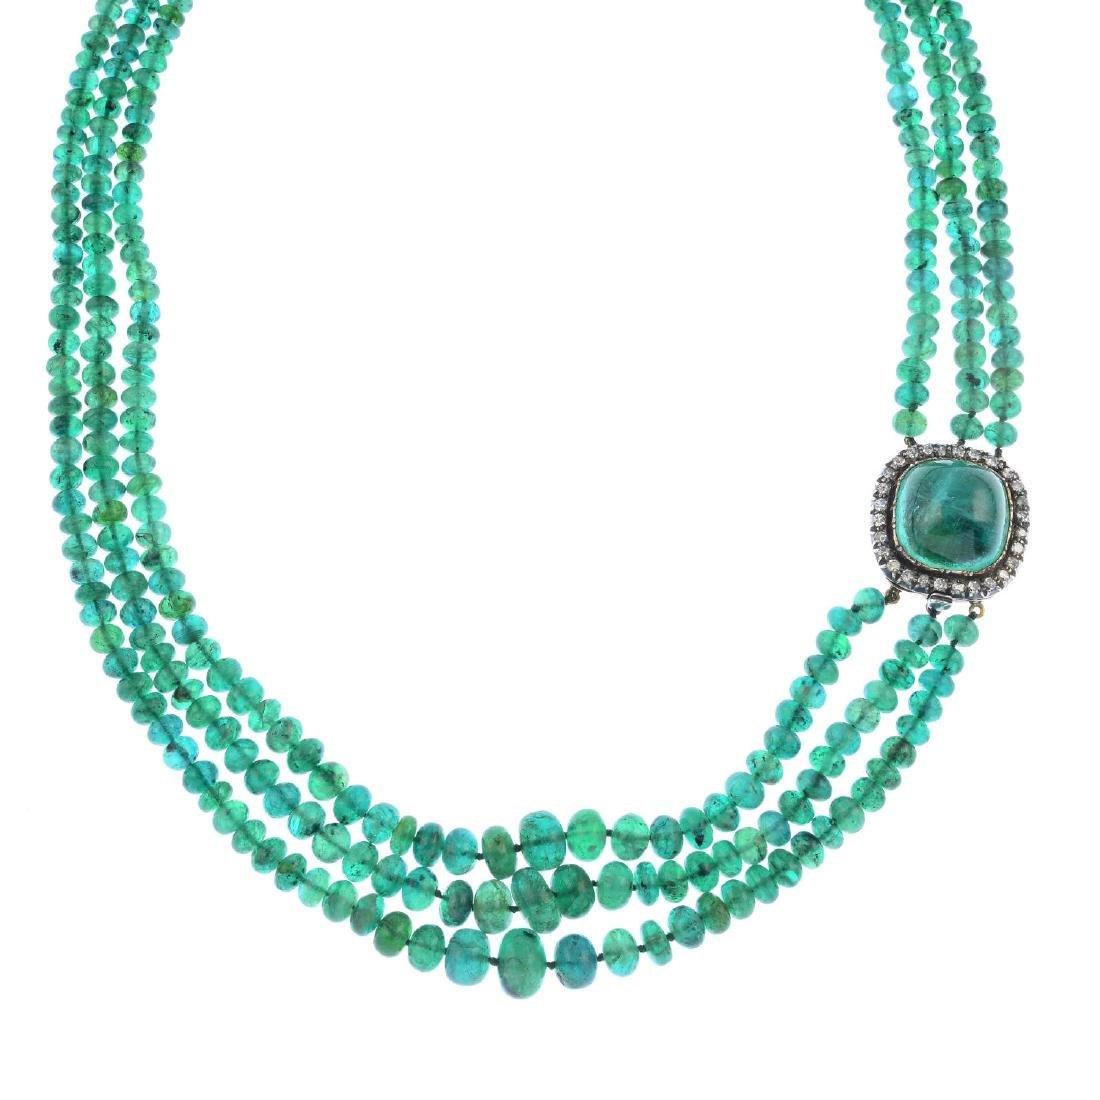 An emerald bead three-row necklace. Comprising three